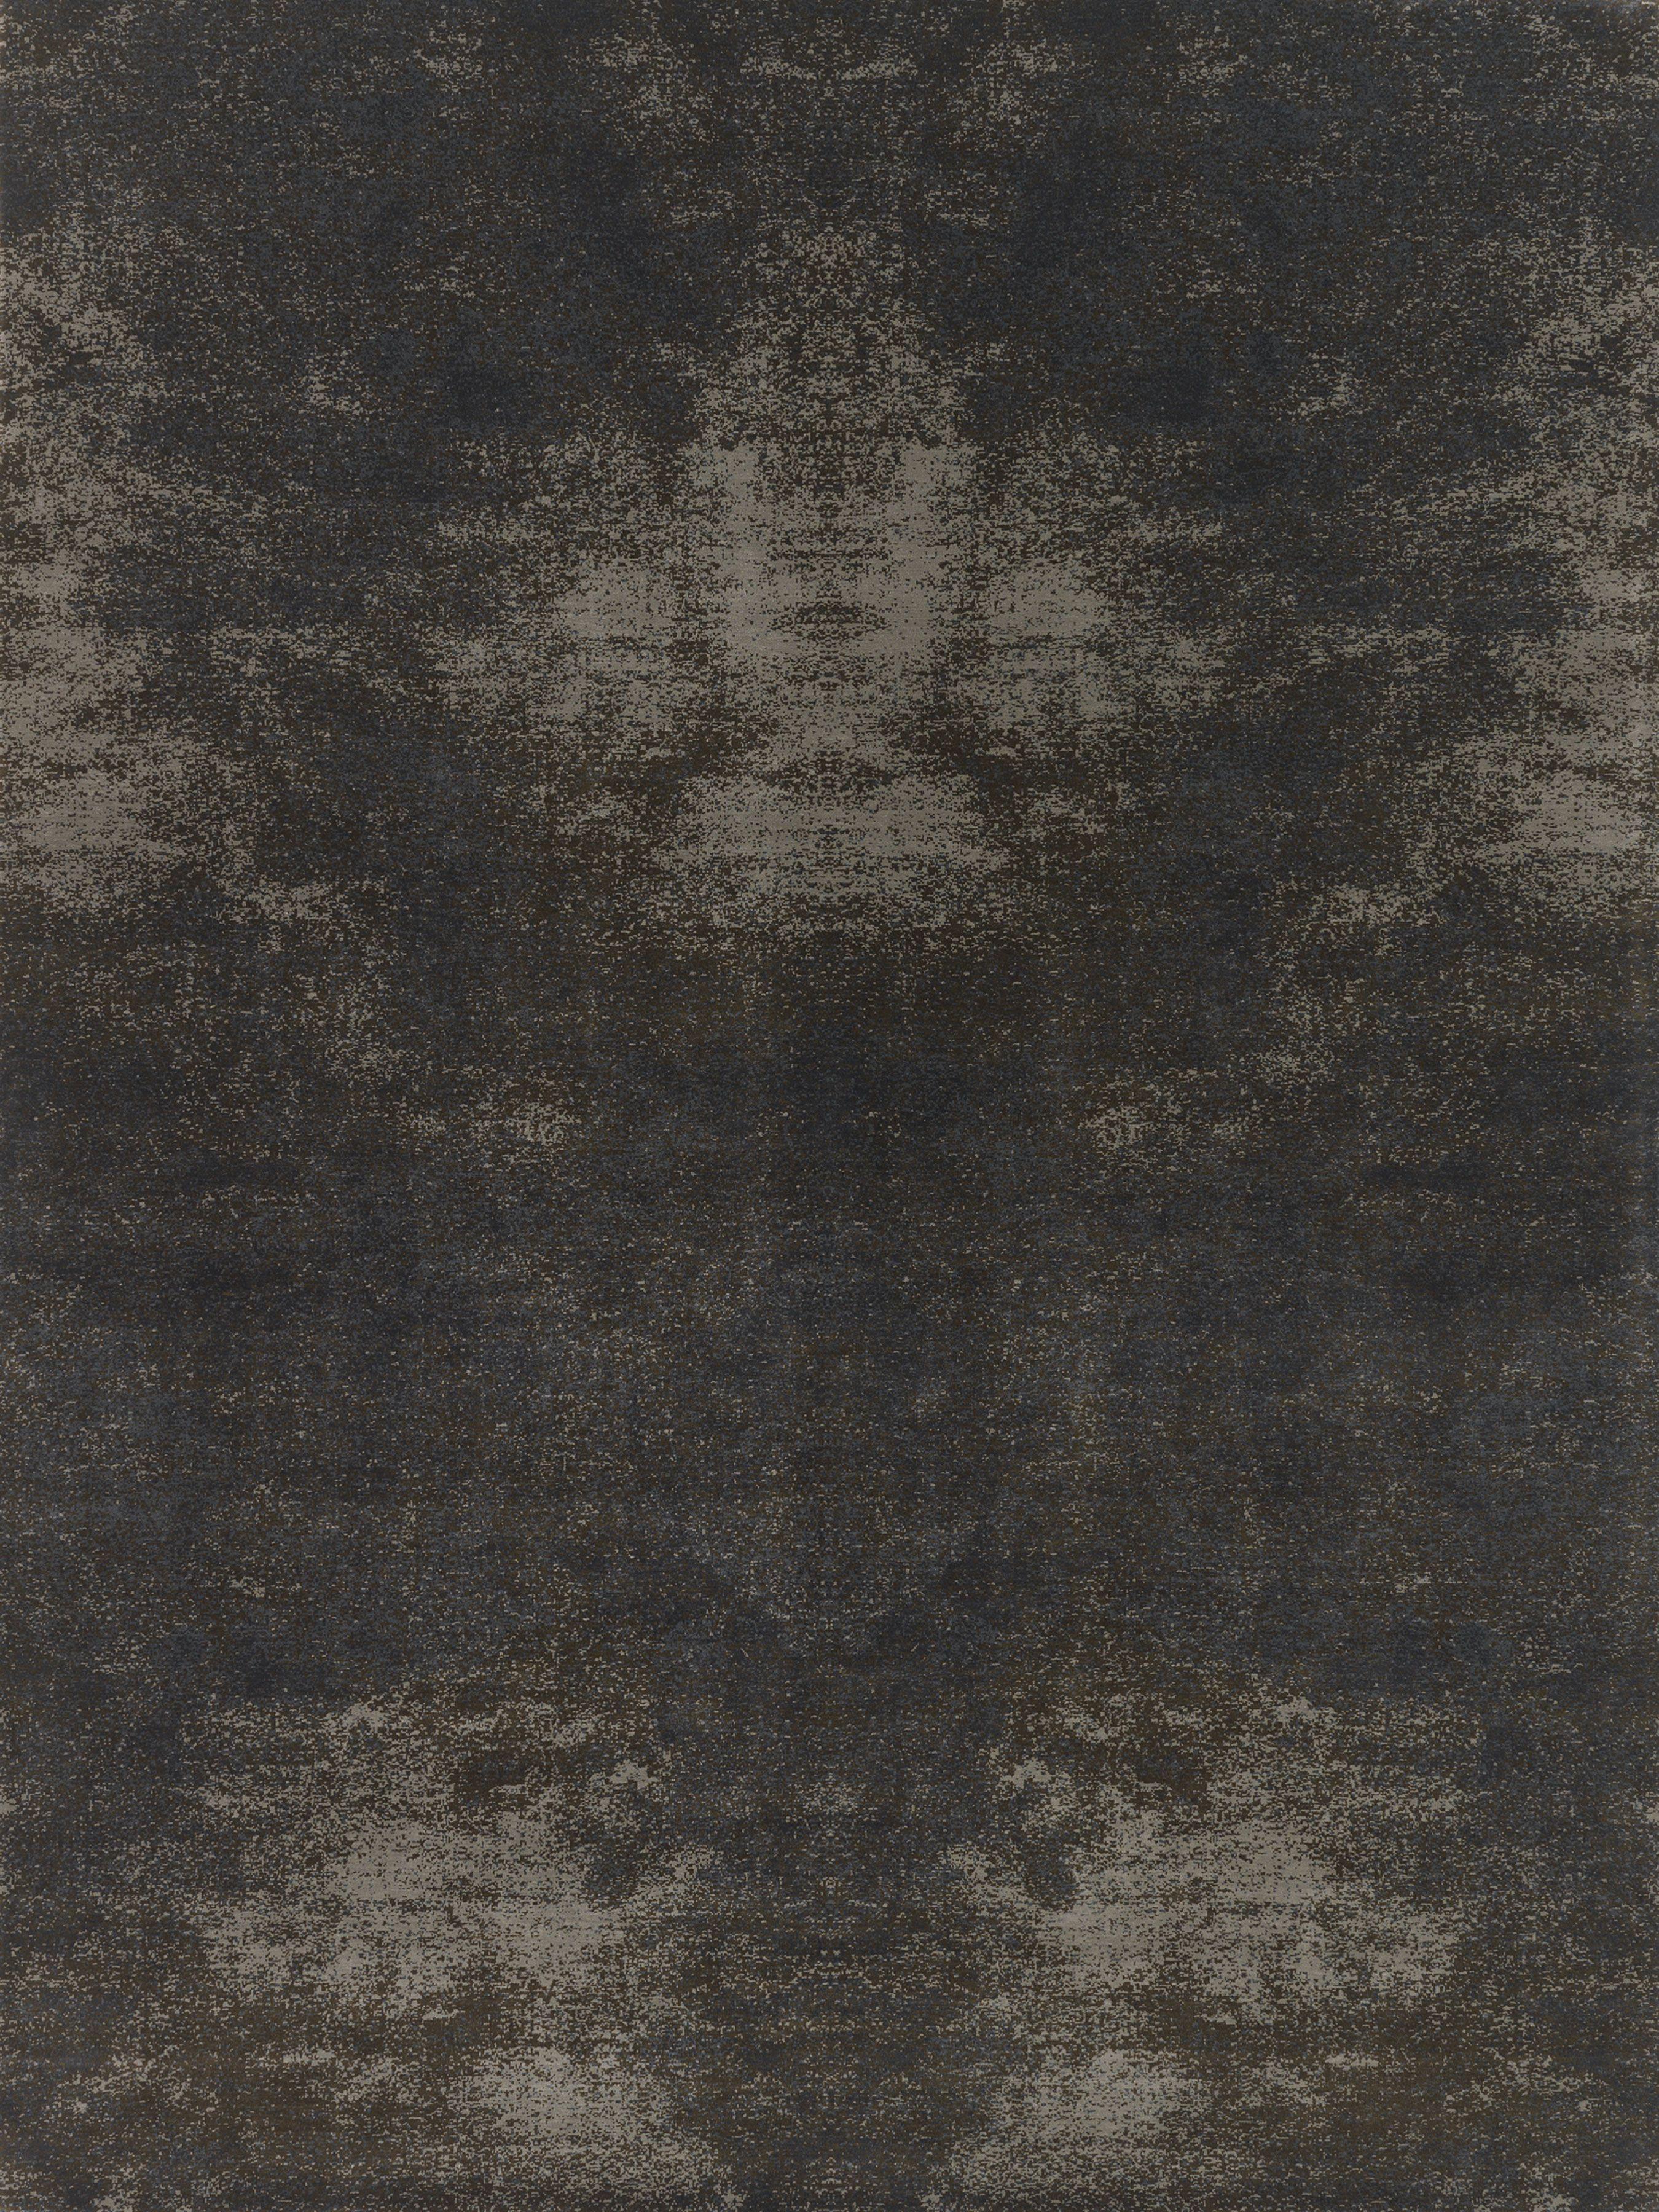 Fort Street Studio Ground Dusk Texture Rugs Carpet